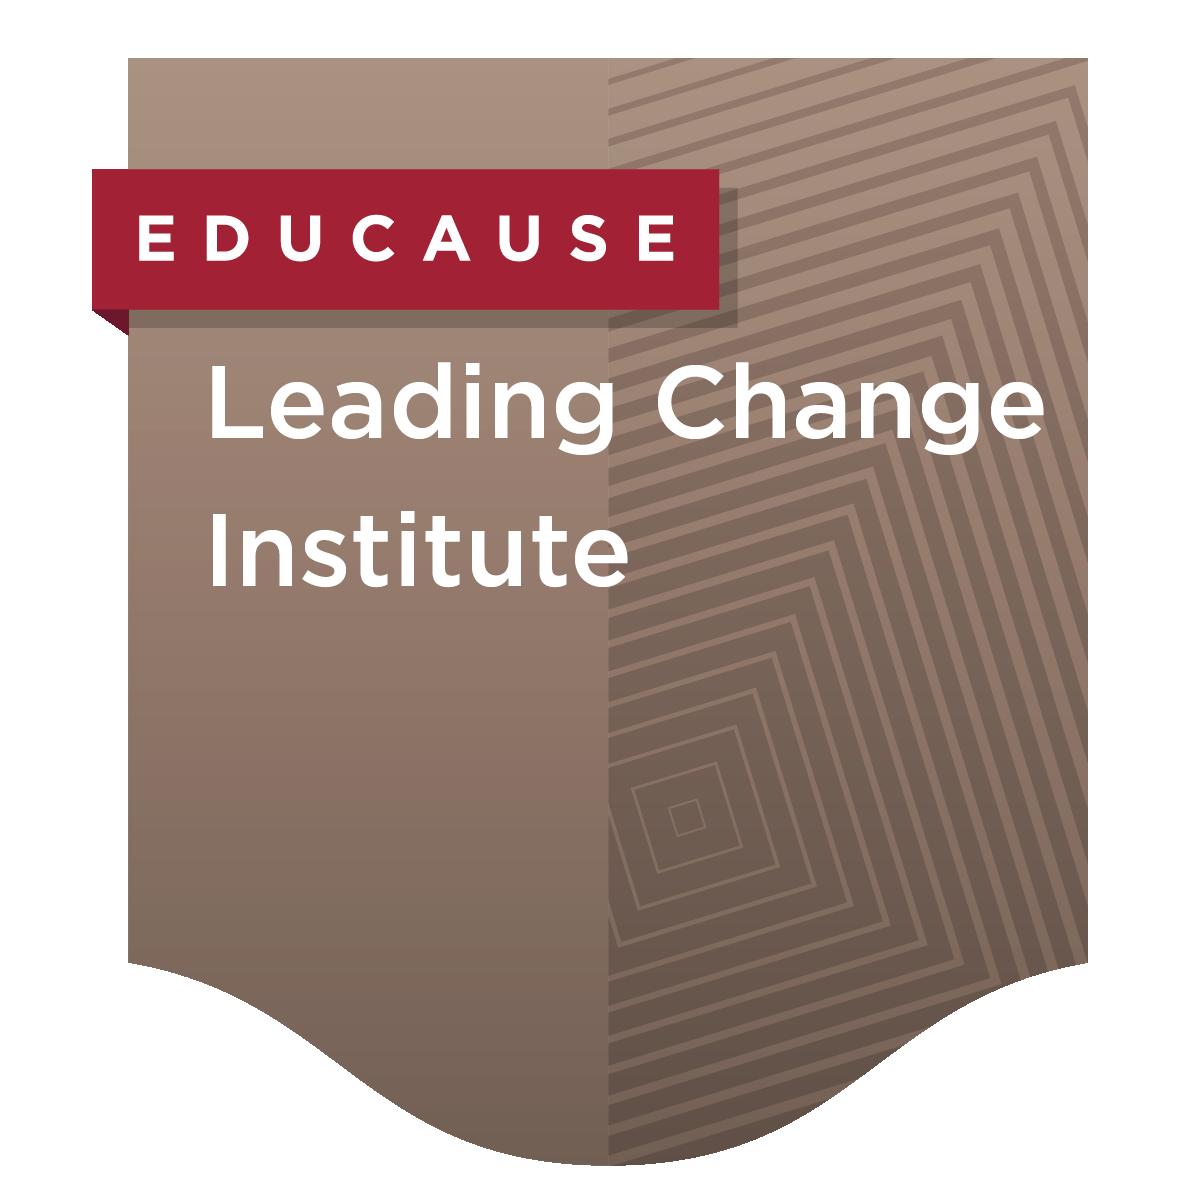 Leading Change Institute Image